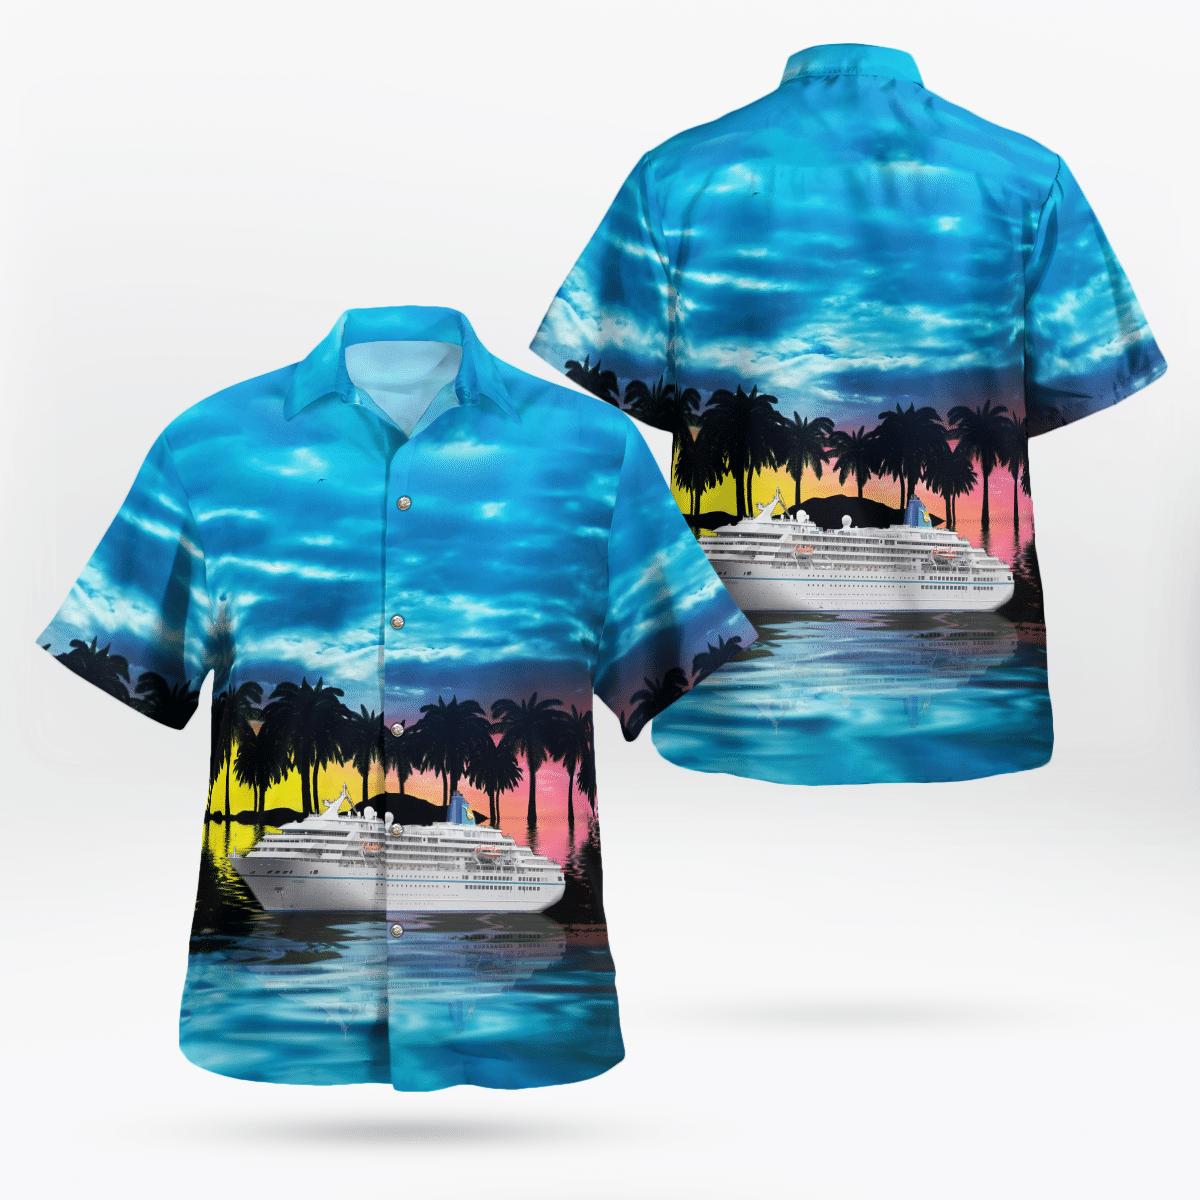 Phoenix Reisen MS Amadea Hawaiian shirt